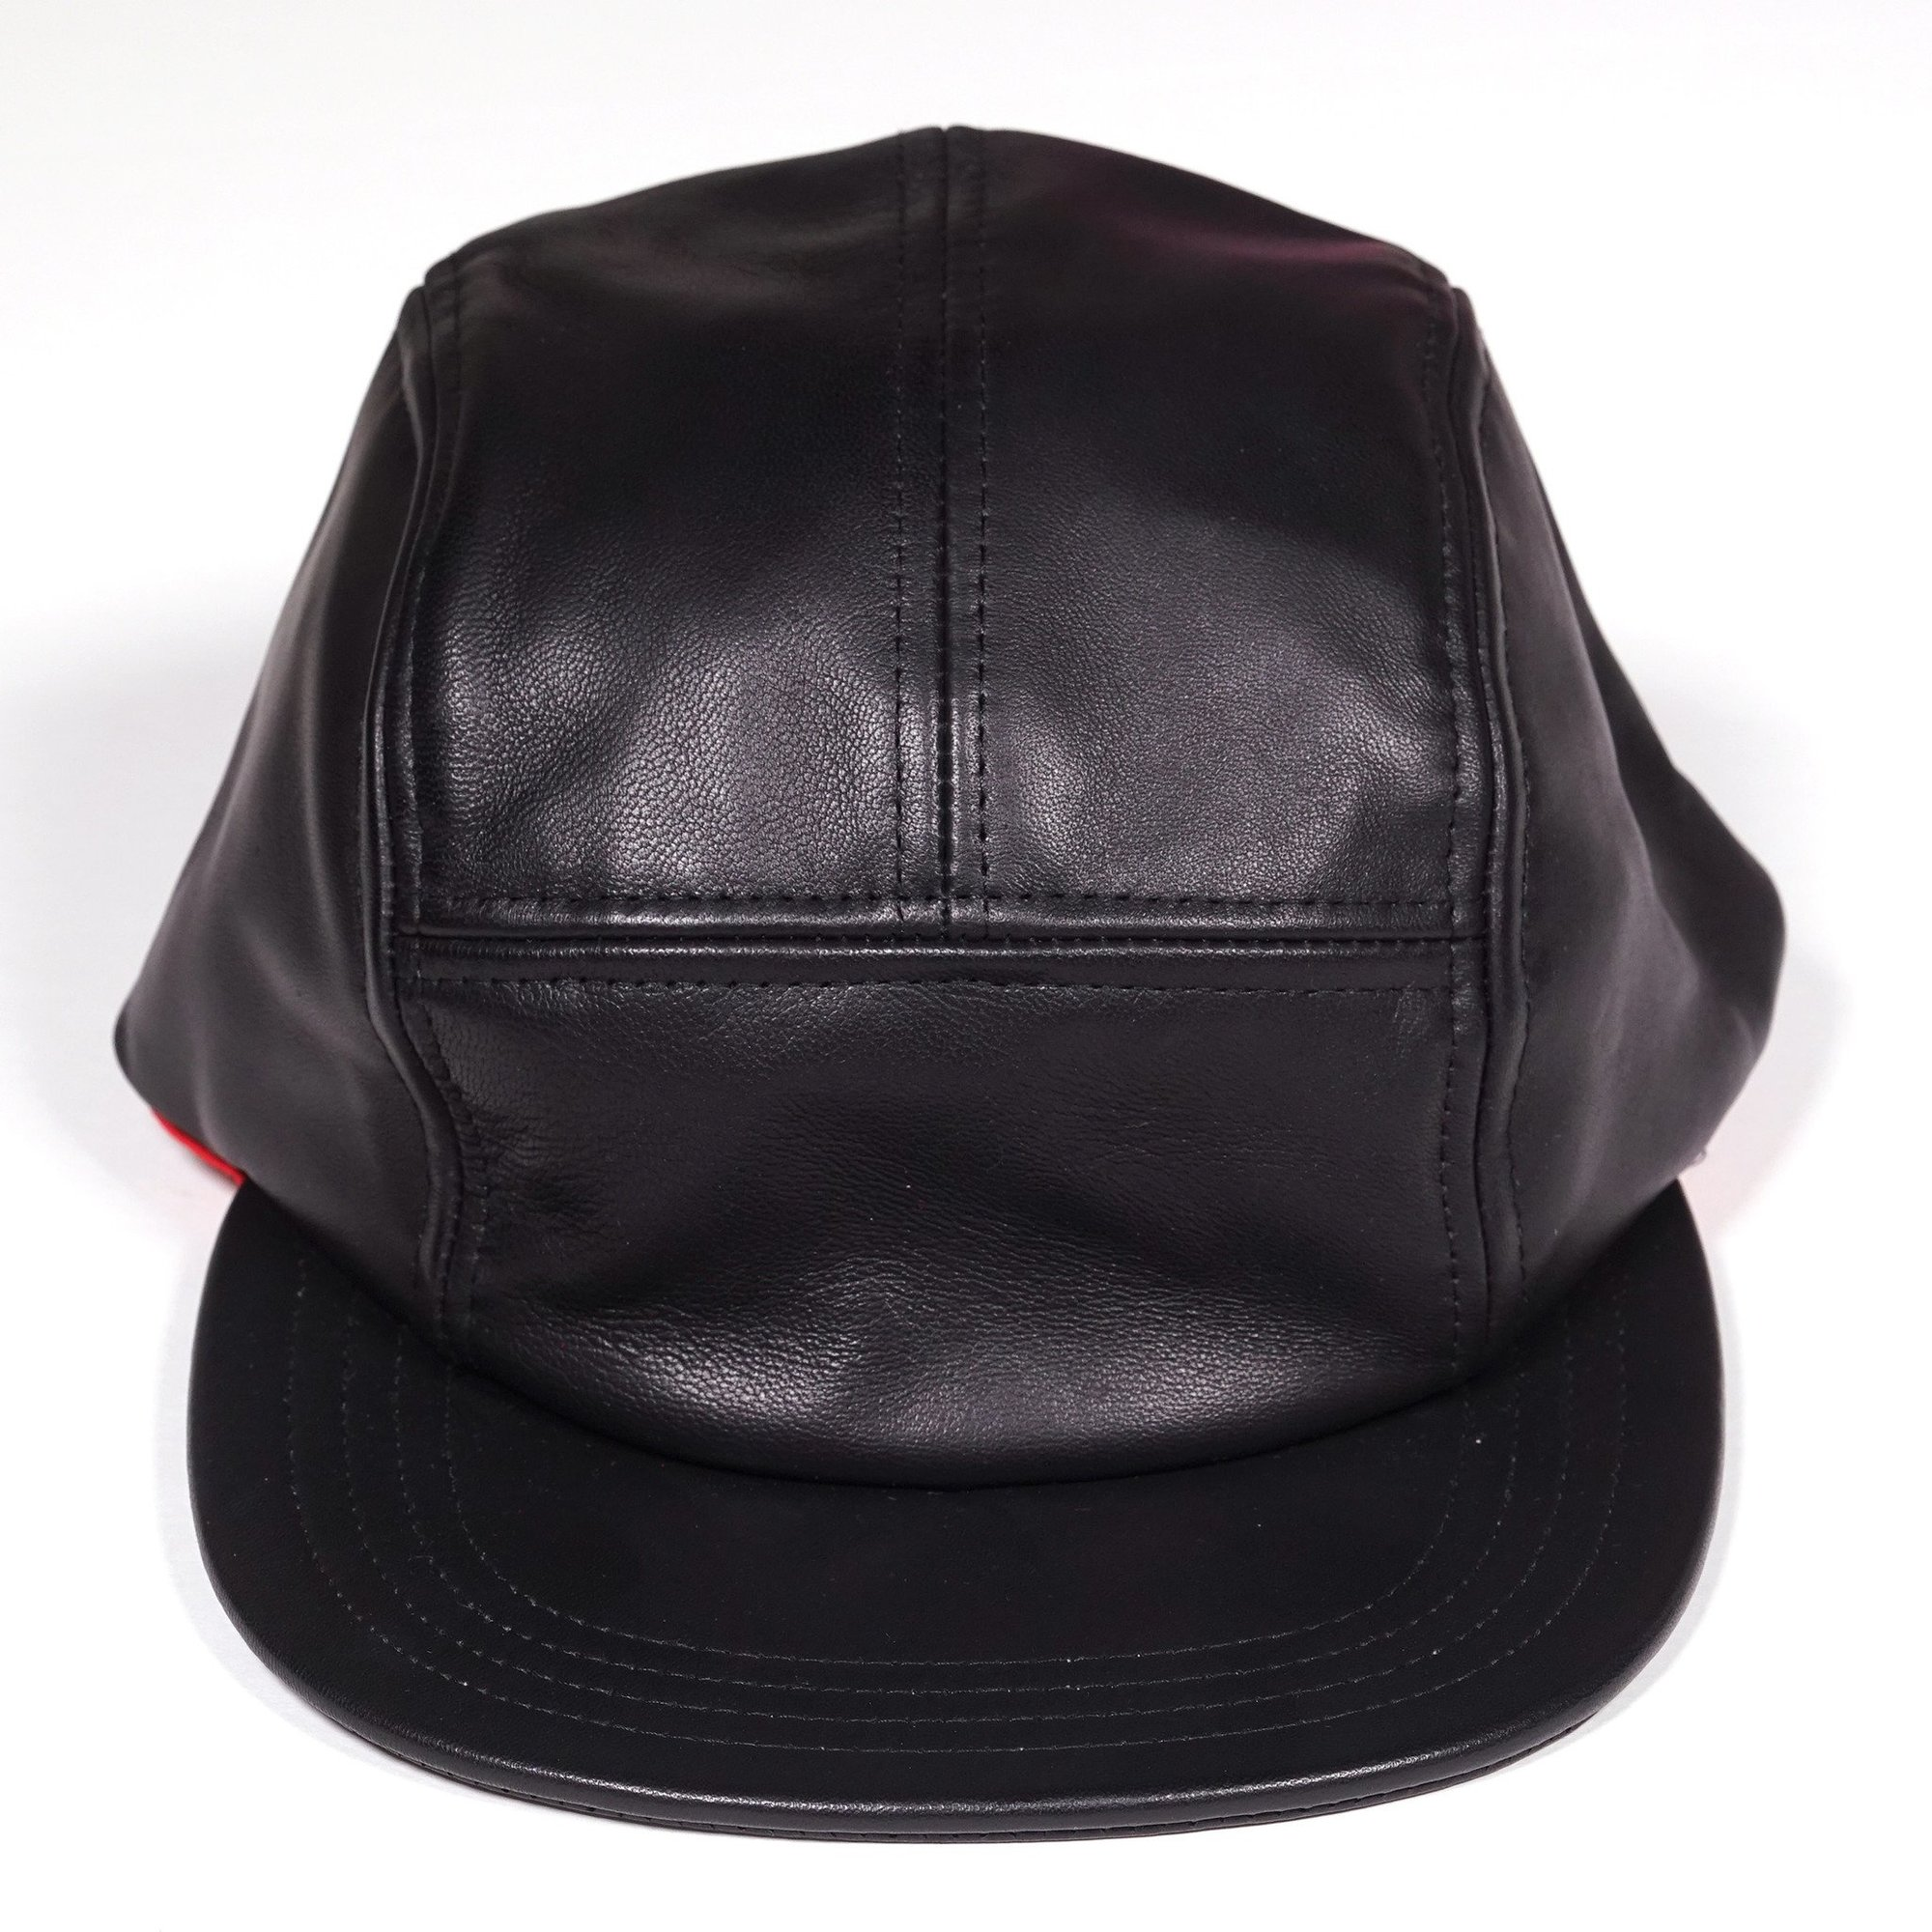 epaulet cap black leather 2.jpg